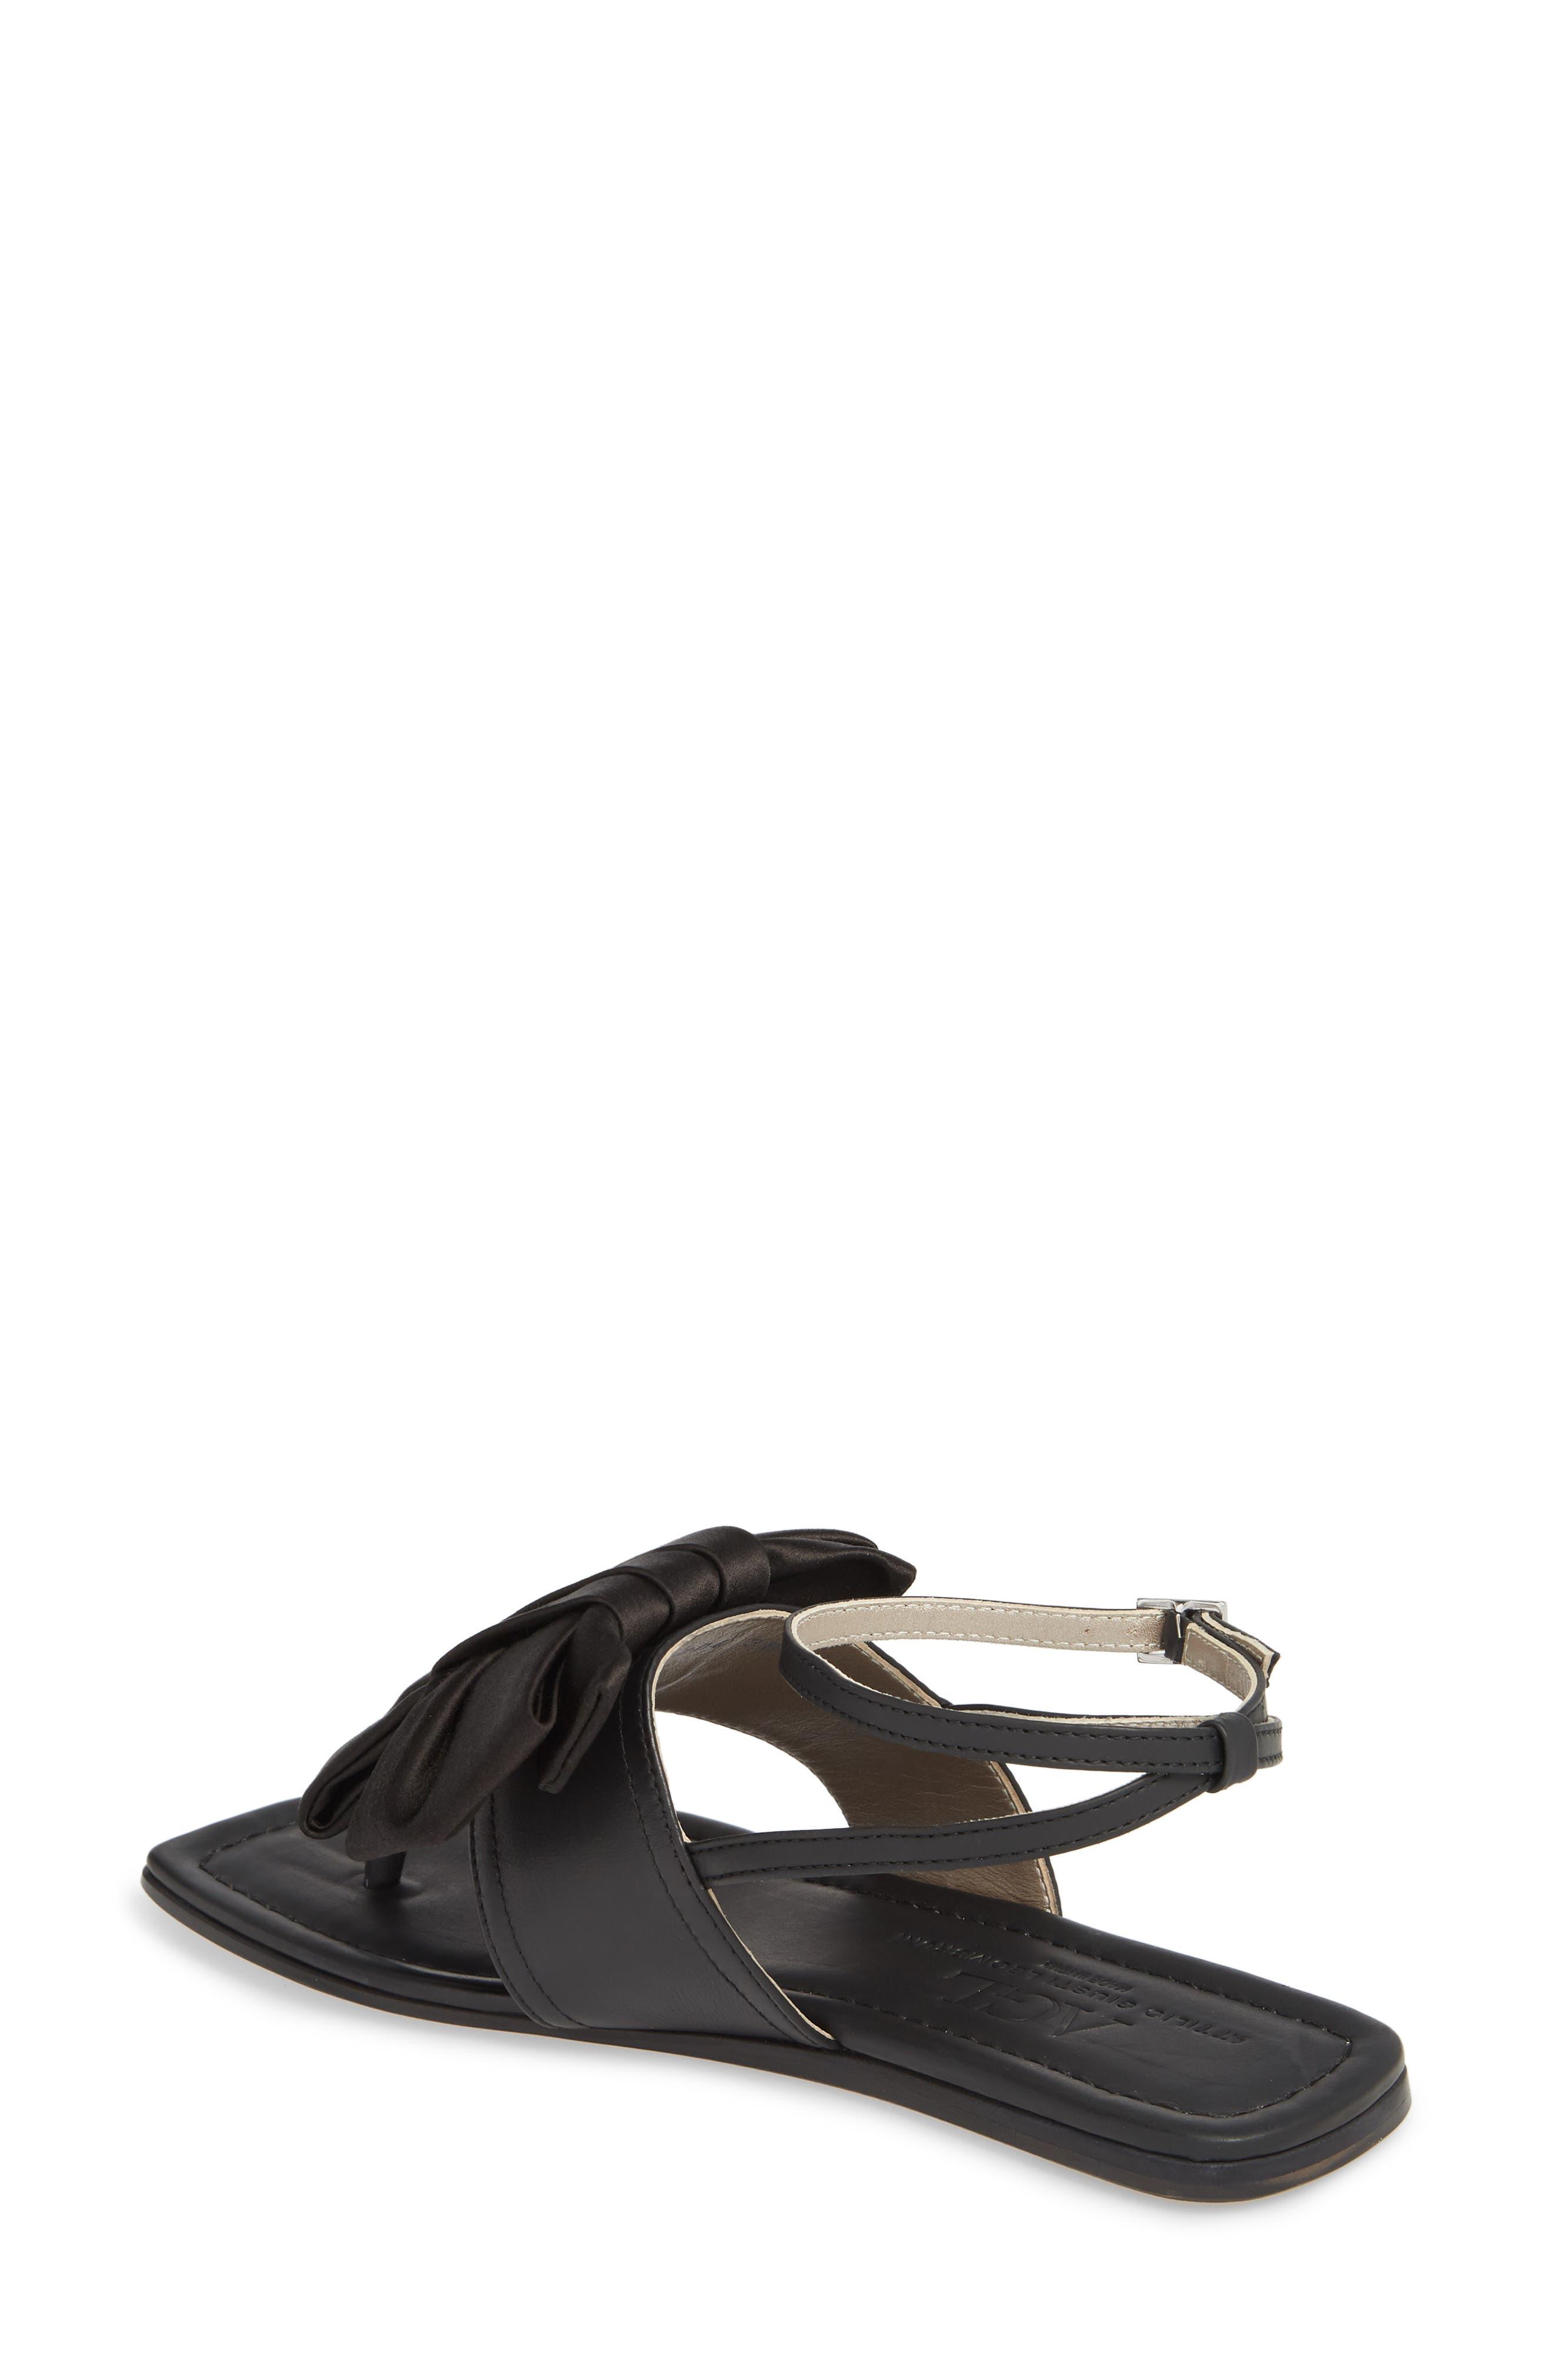 Ankle Strap Sandal,                             Alternate thumbnail 2, color,                             BLACK LEATHER